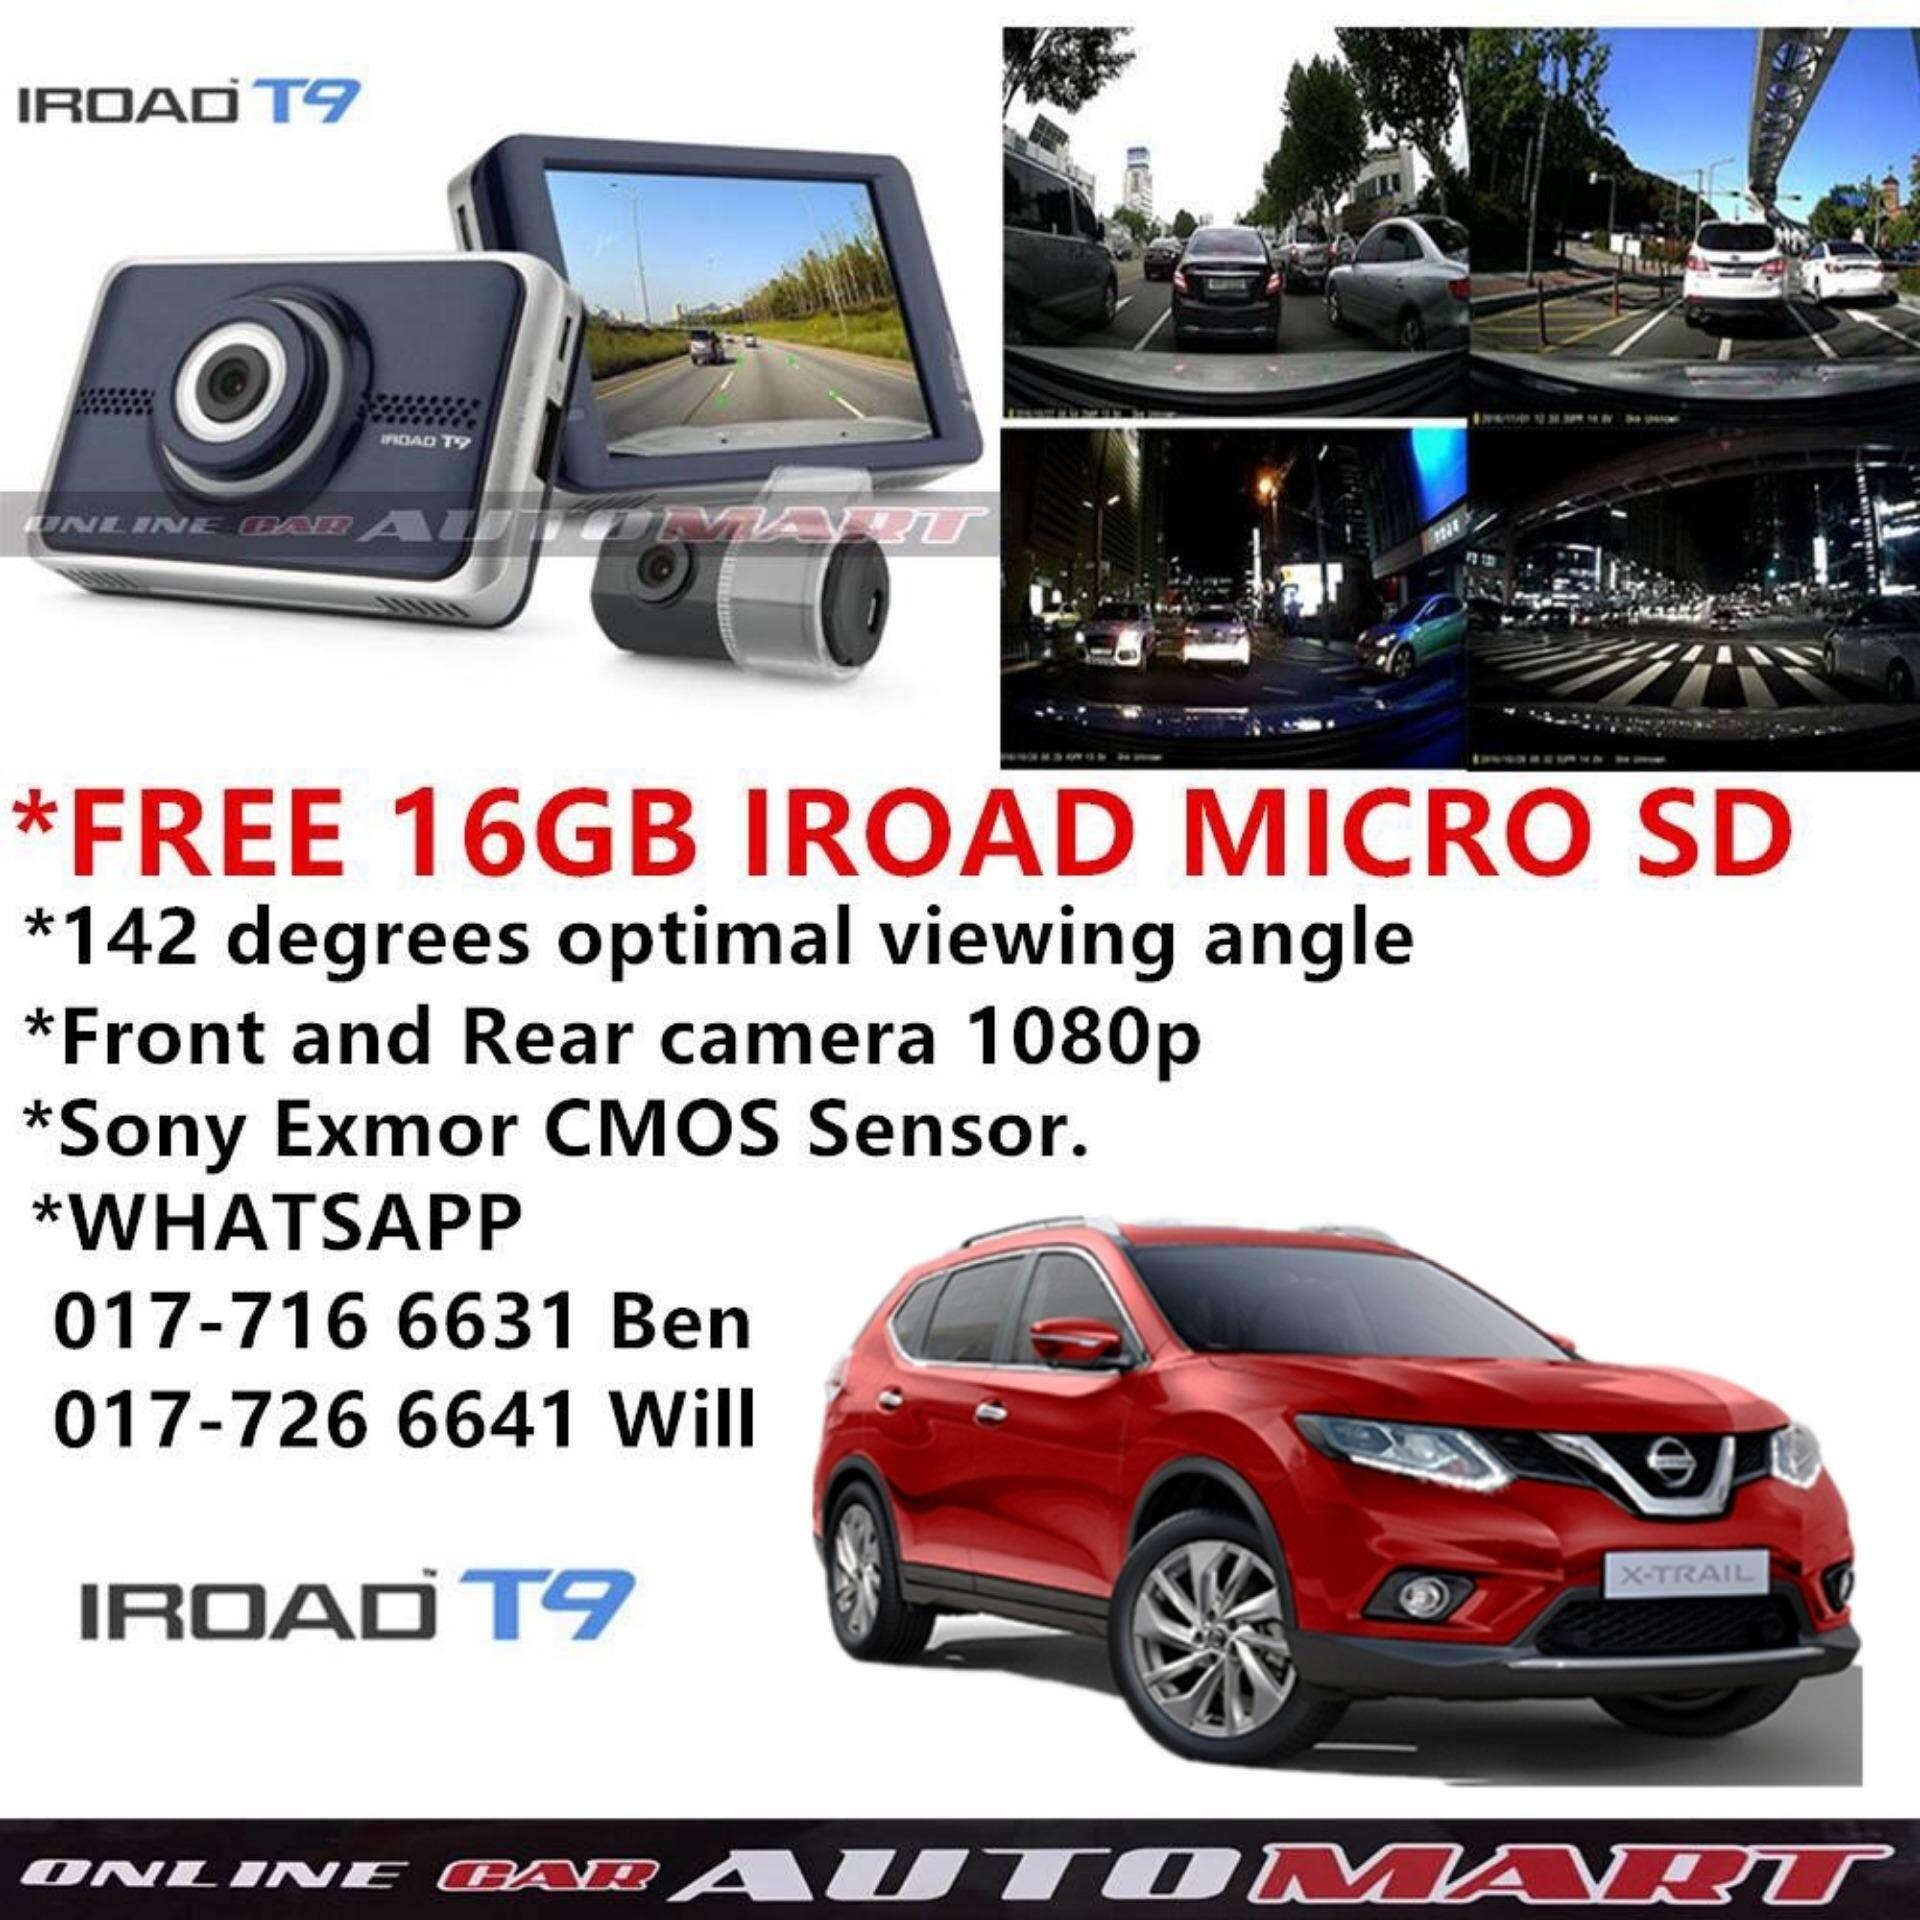 Nissan X-Trail Old/X-Trail Yr 2015-IROAD T9 WIFI 2CH Blackbox Dashcam 16GB Set FullHD 1080p WIFI DVR Car Vehicle Video Recorder - Dash Camera Video Recorder Digital DVR Recorder